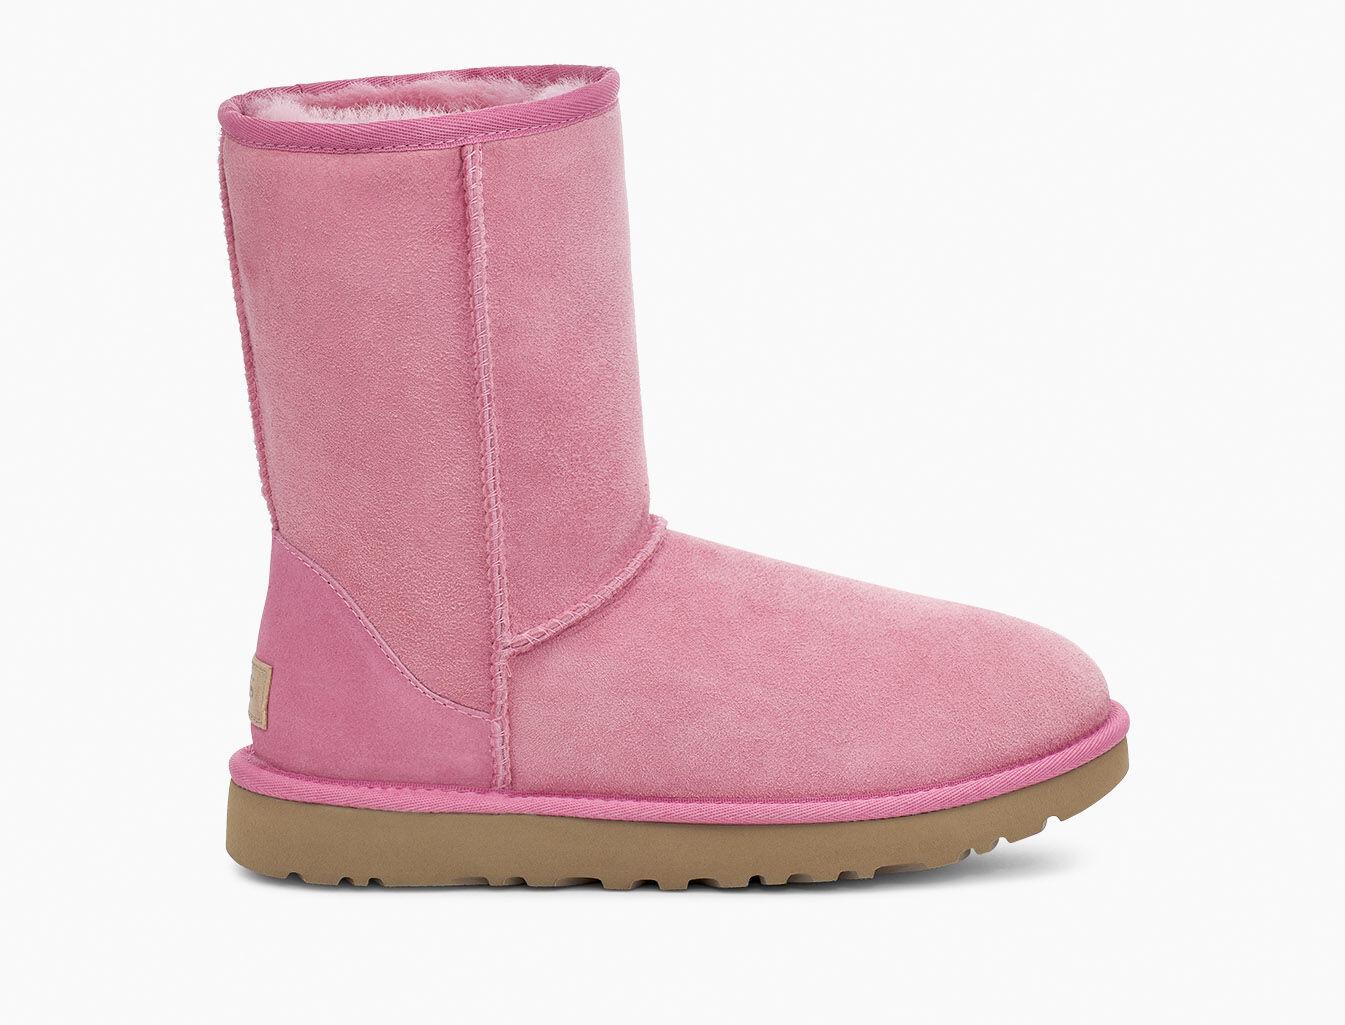 UGG Classic Sheepskin Boots   UGG® Official